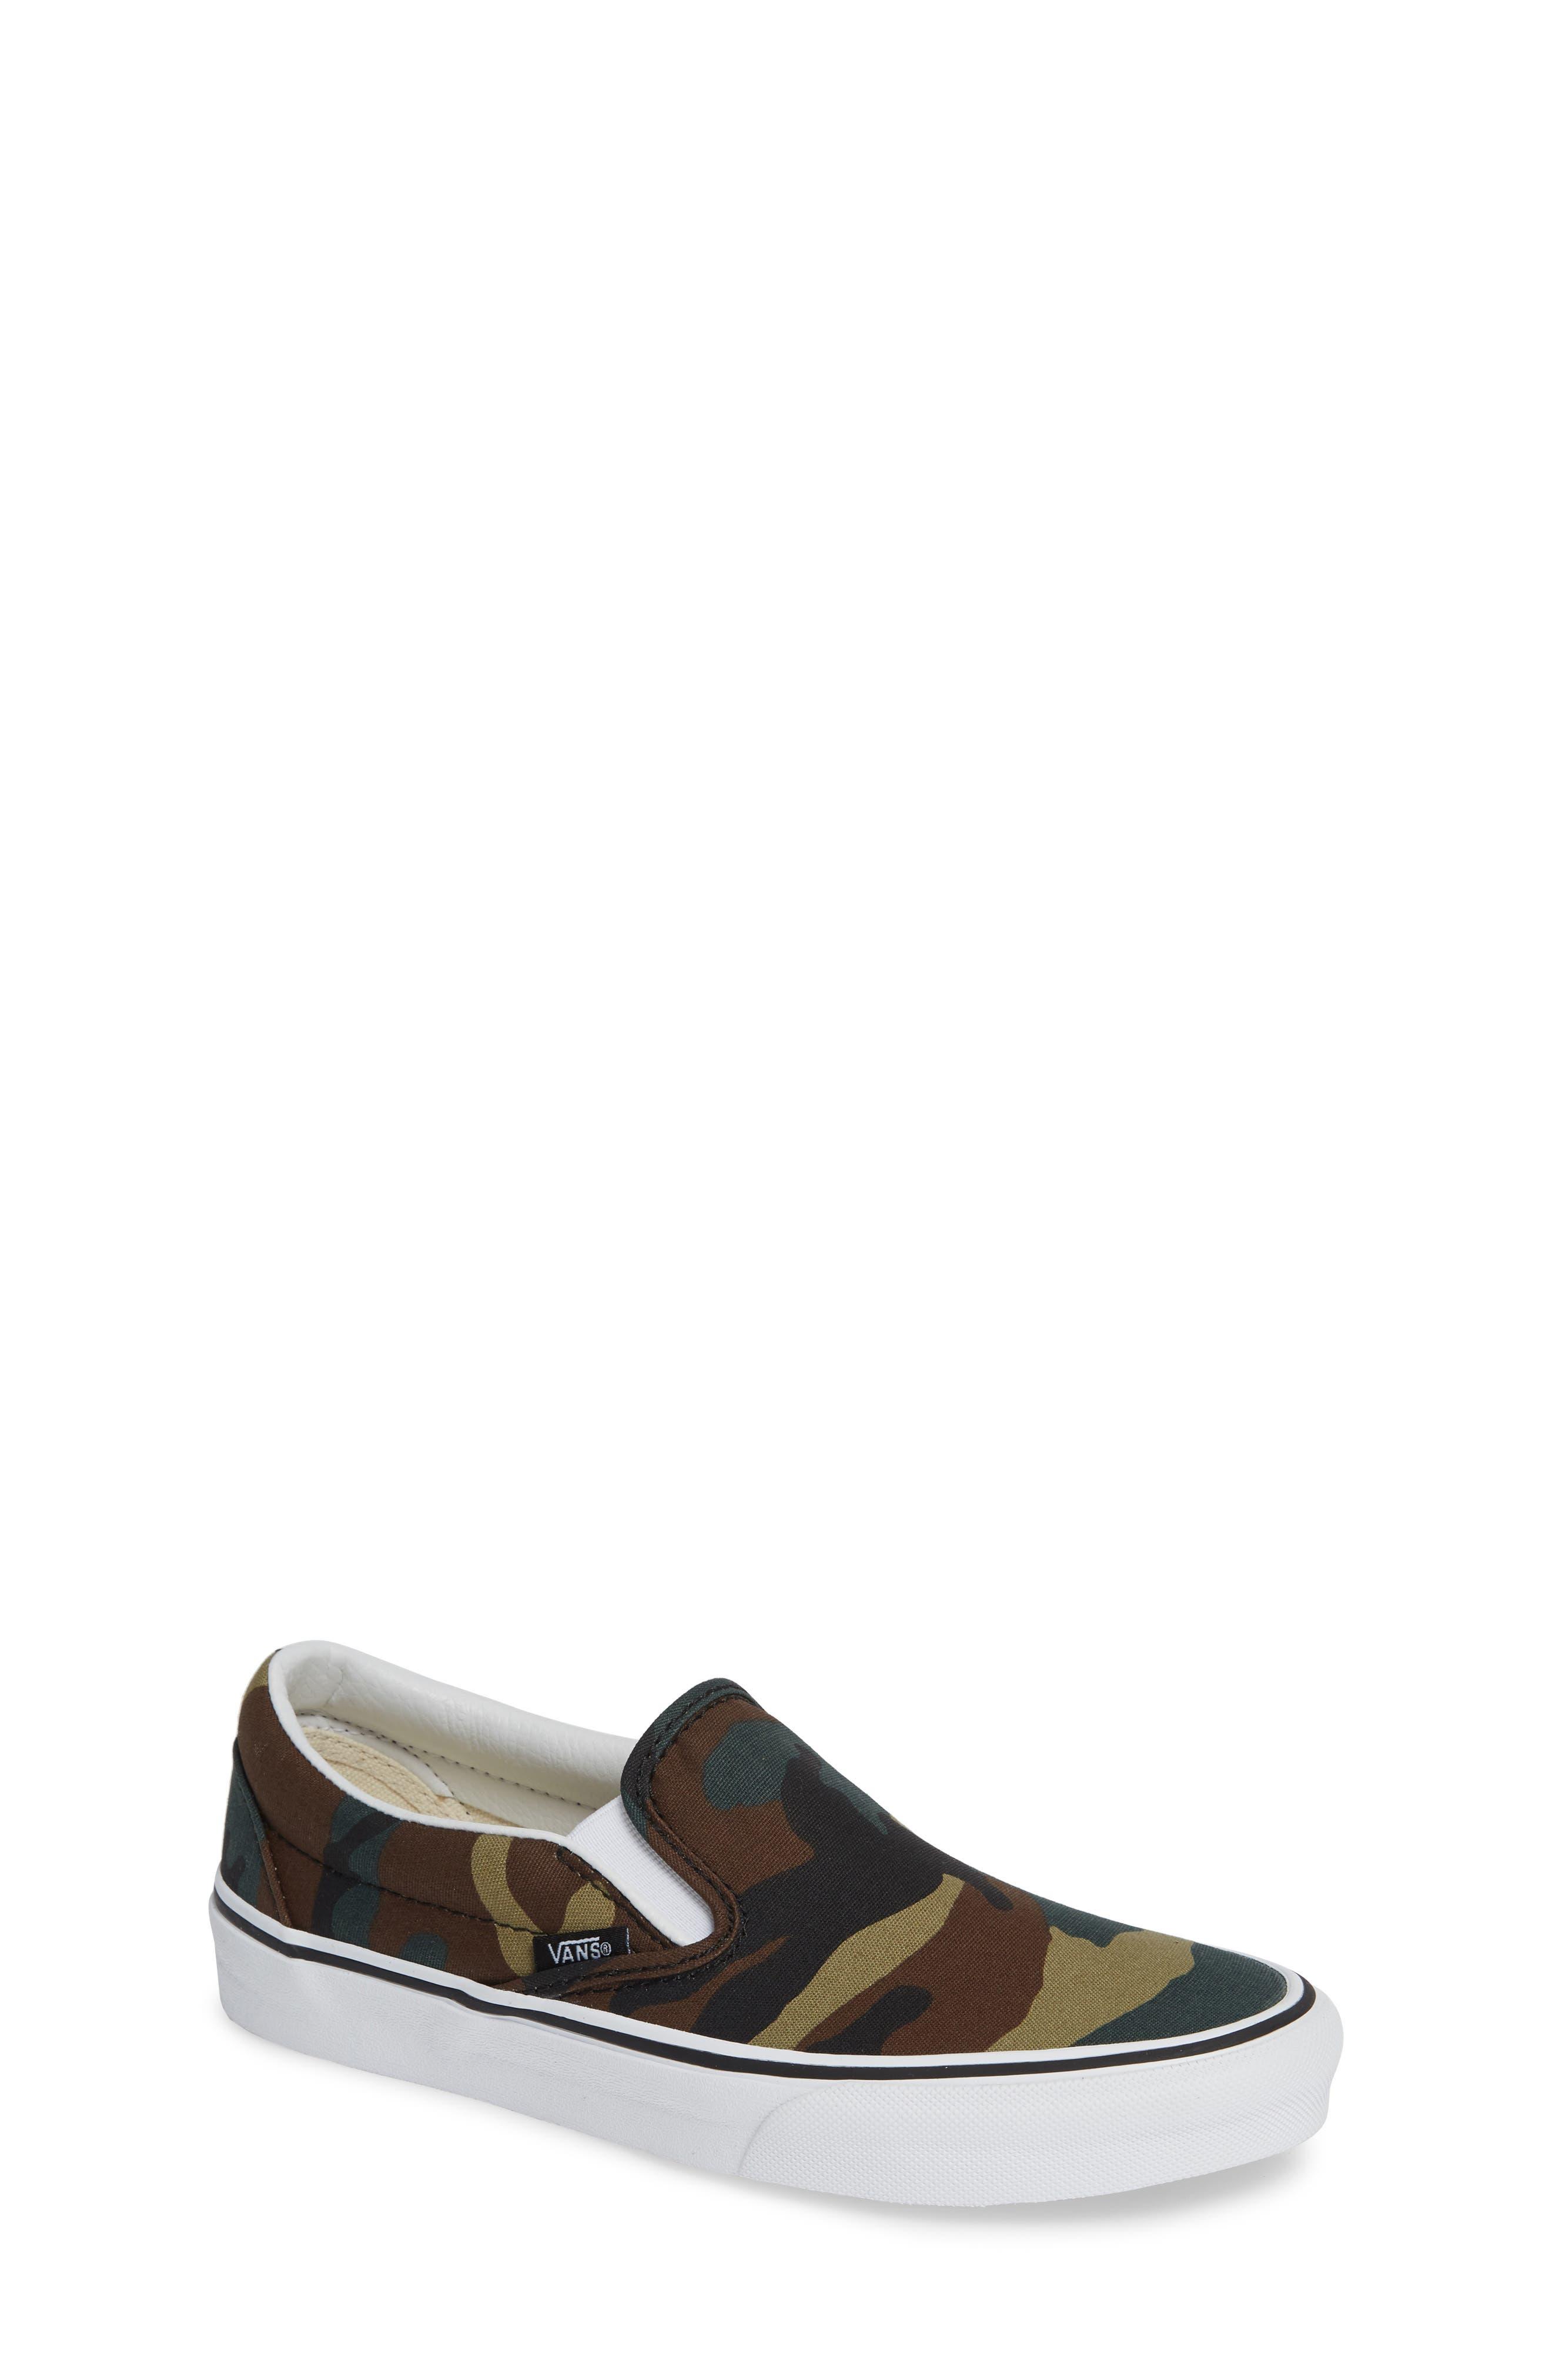 Classic Slip-On Sneaker,                             Main thumbnail 1, color,                             Black / Woodland